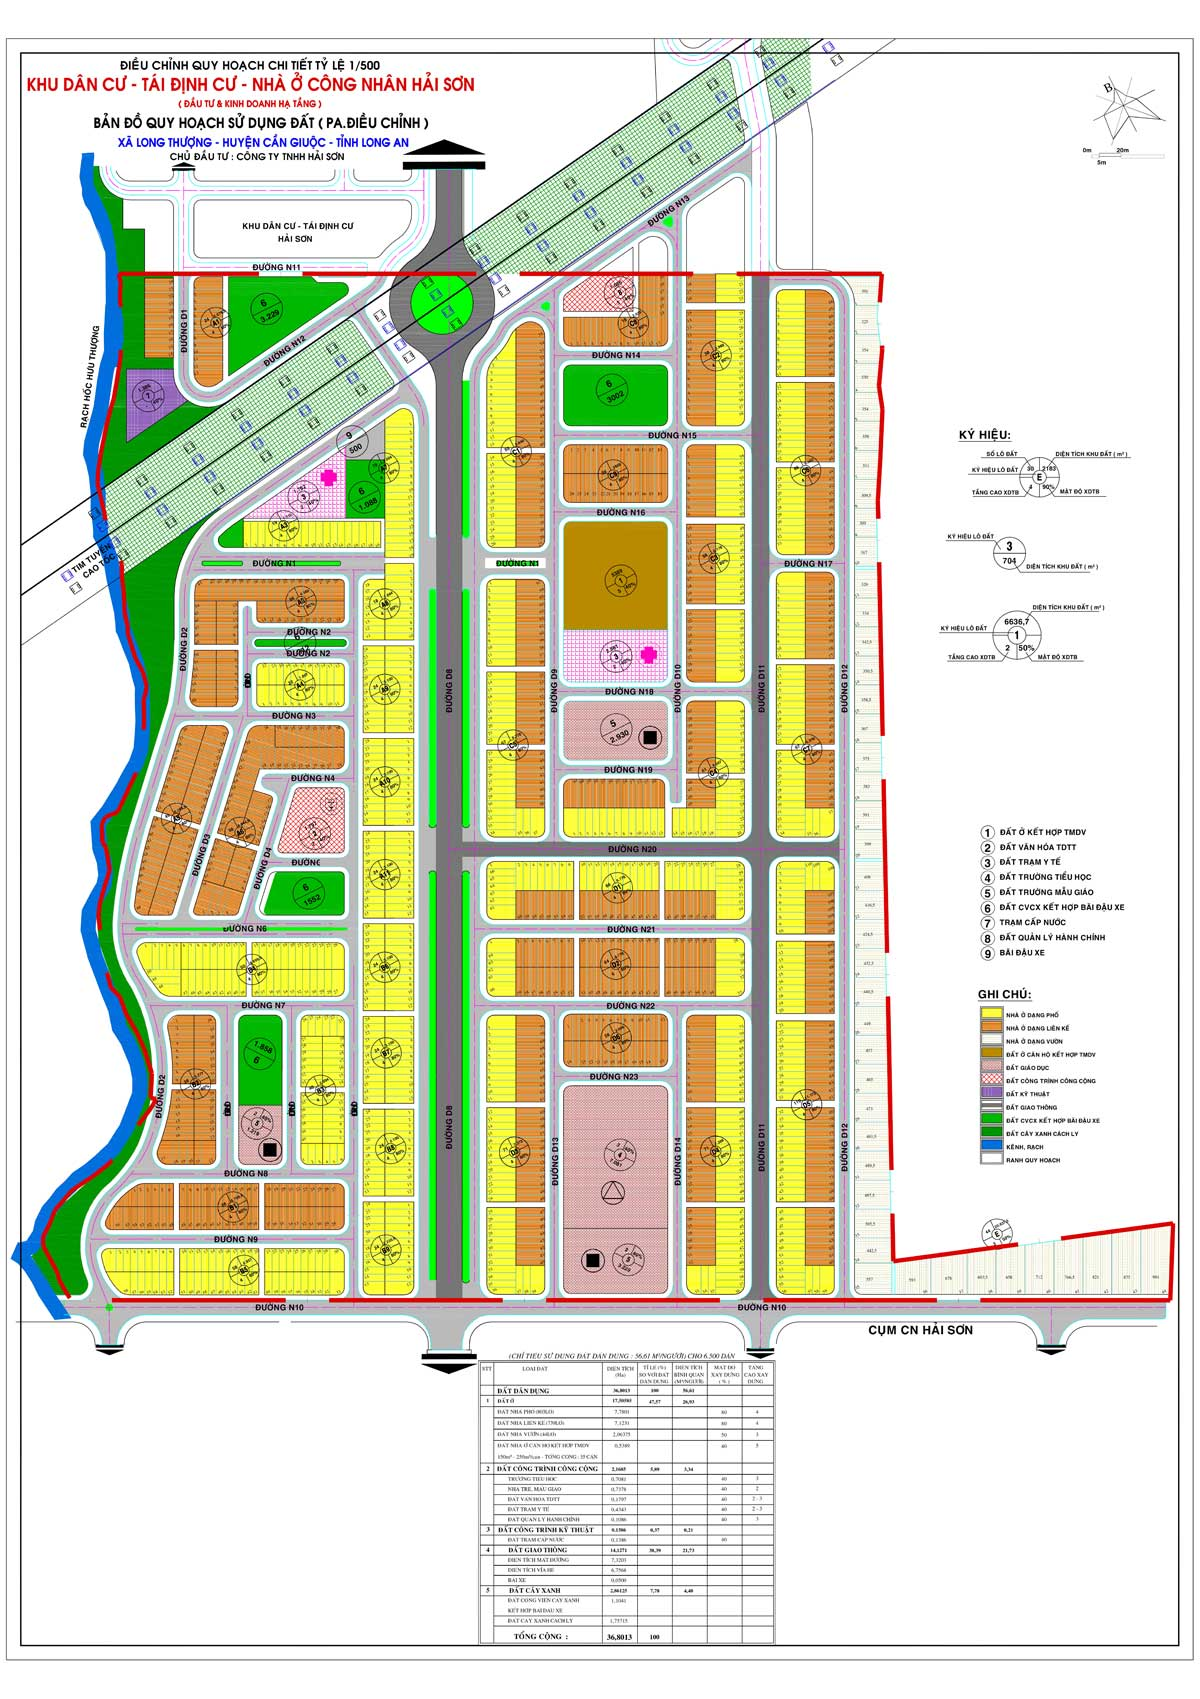 quy hoach du an Central Hill Nam Sai Gon - quy-hoạch-dự-án-Central-Hill-Nam-Sài-Gòn